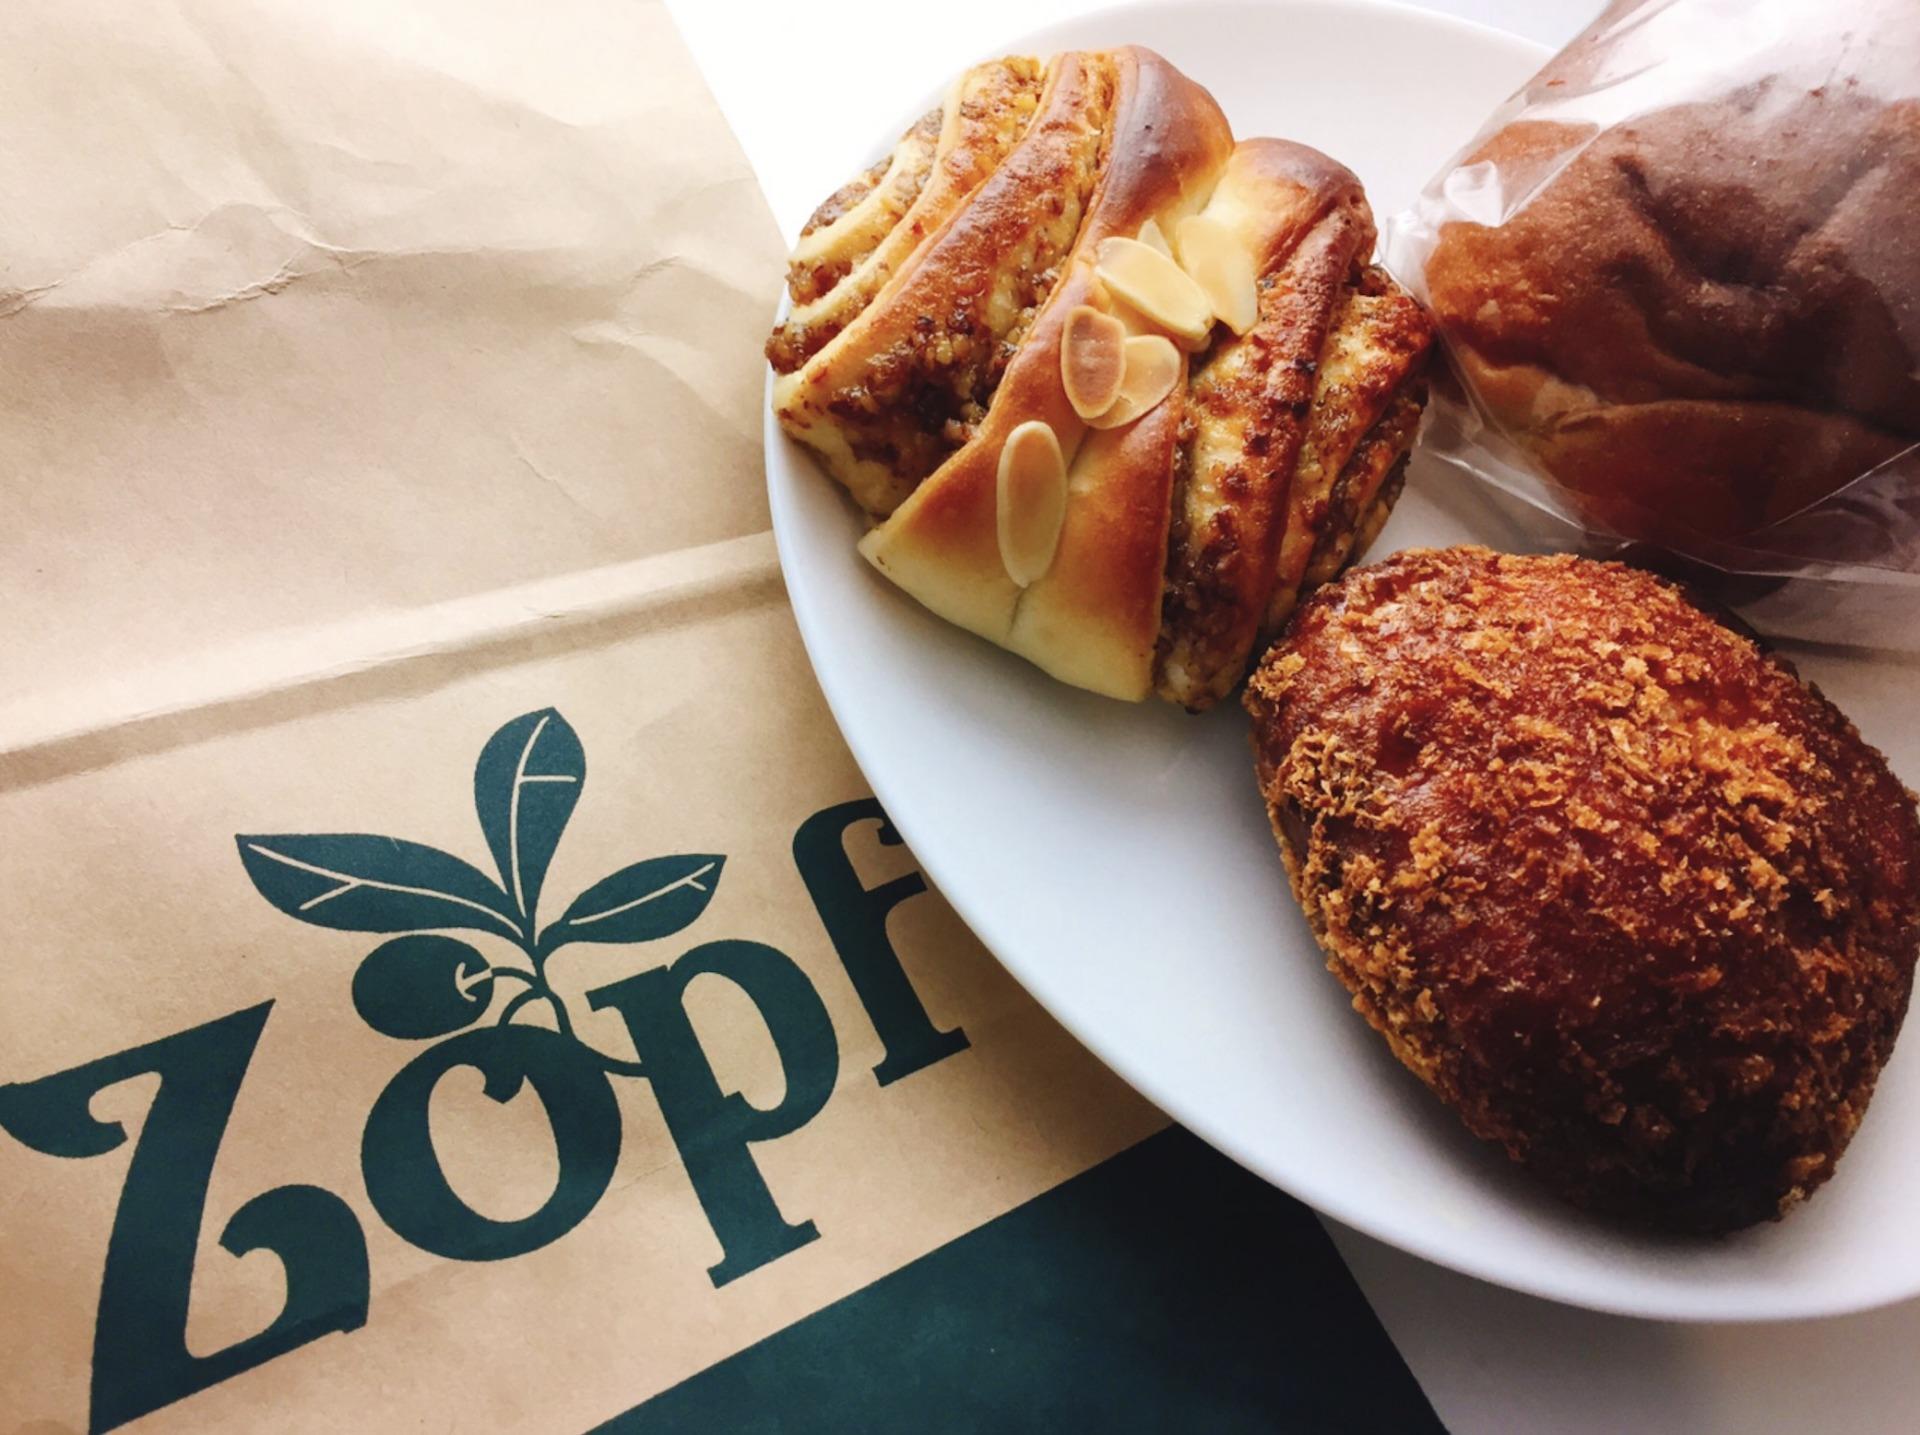 『Zopf』のカレーパン